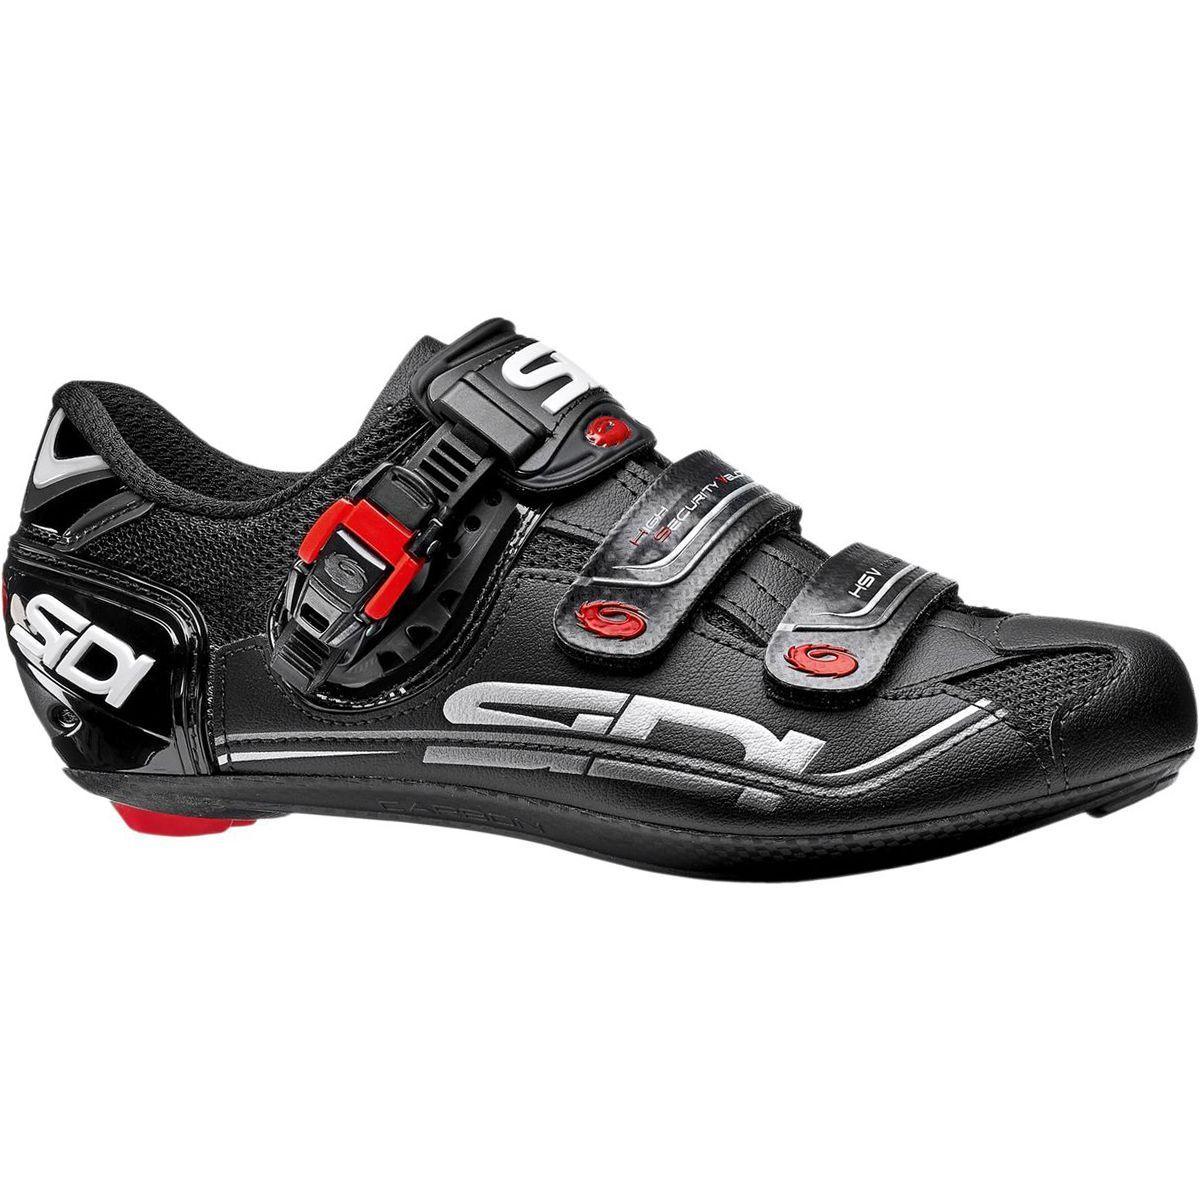 Sidi Genius 7 Carbon Mega Shoe Black 40 0 Wide Road Cycling